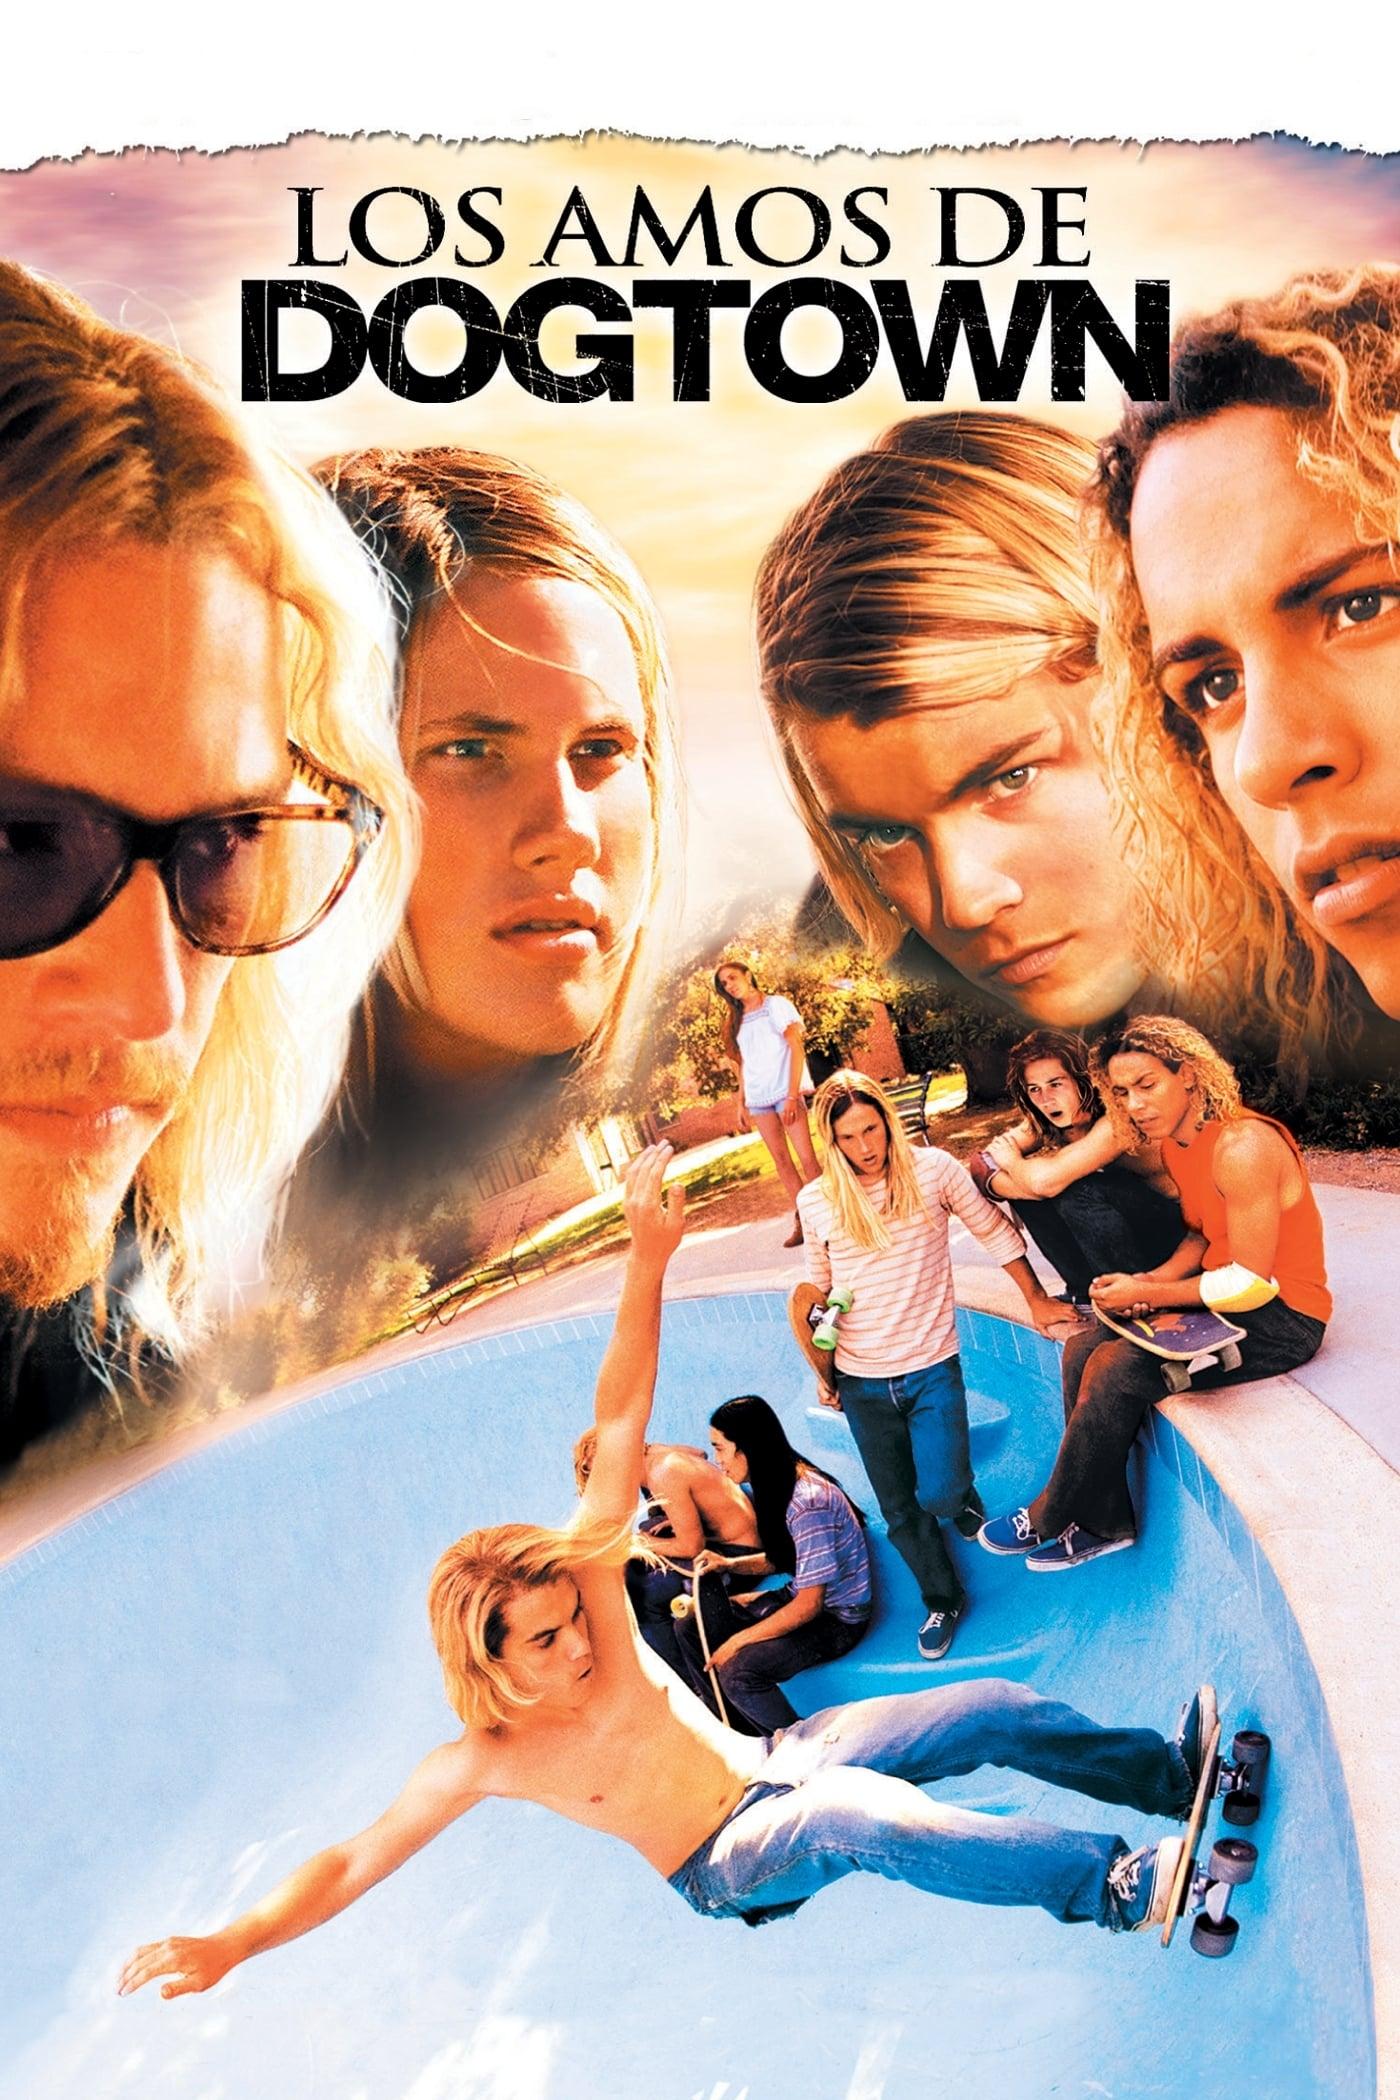 Los amos de Dogtown poster